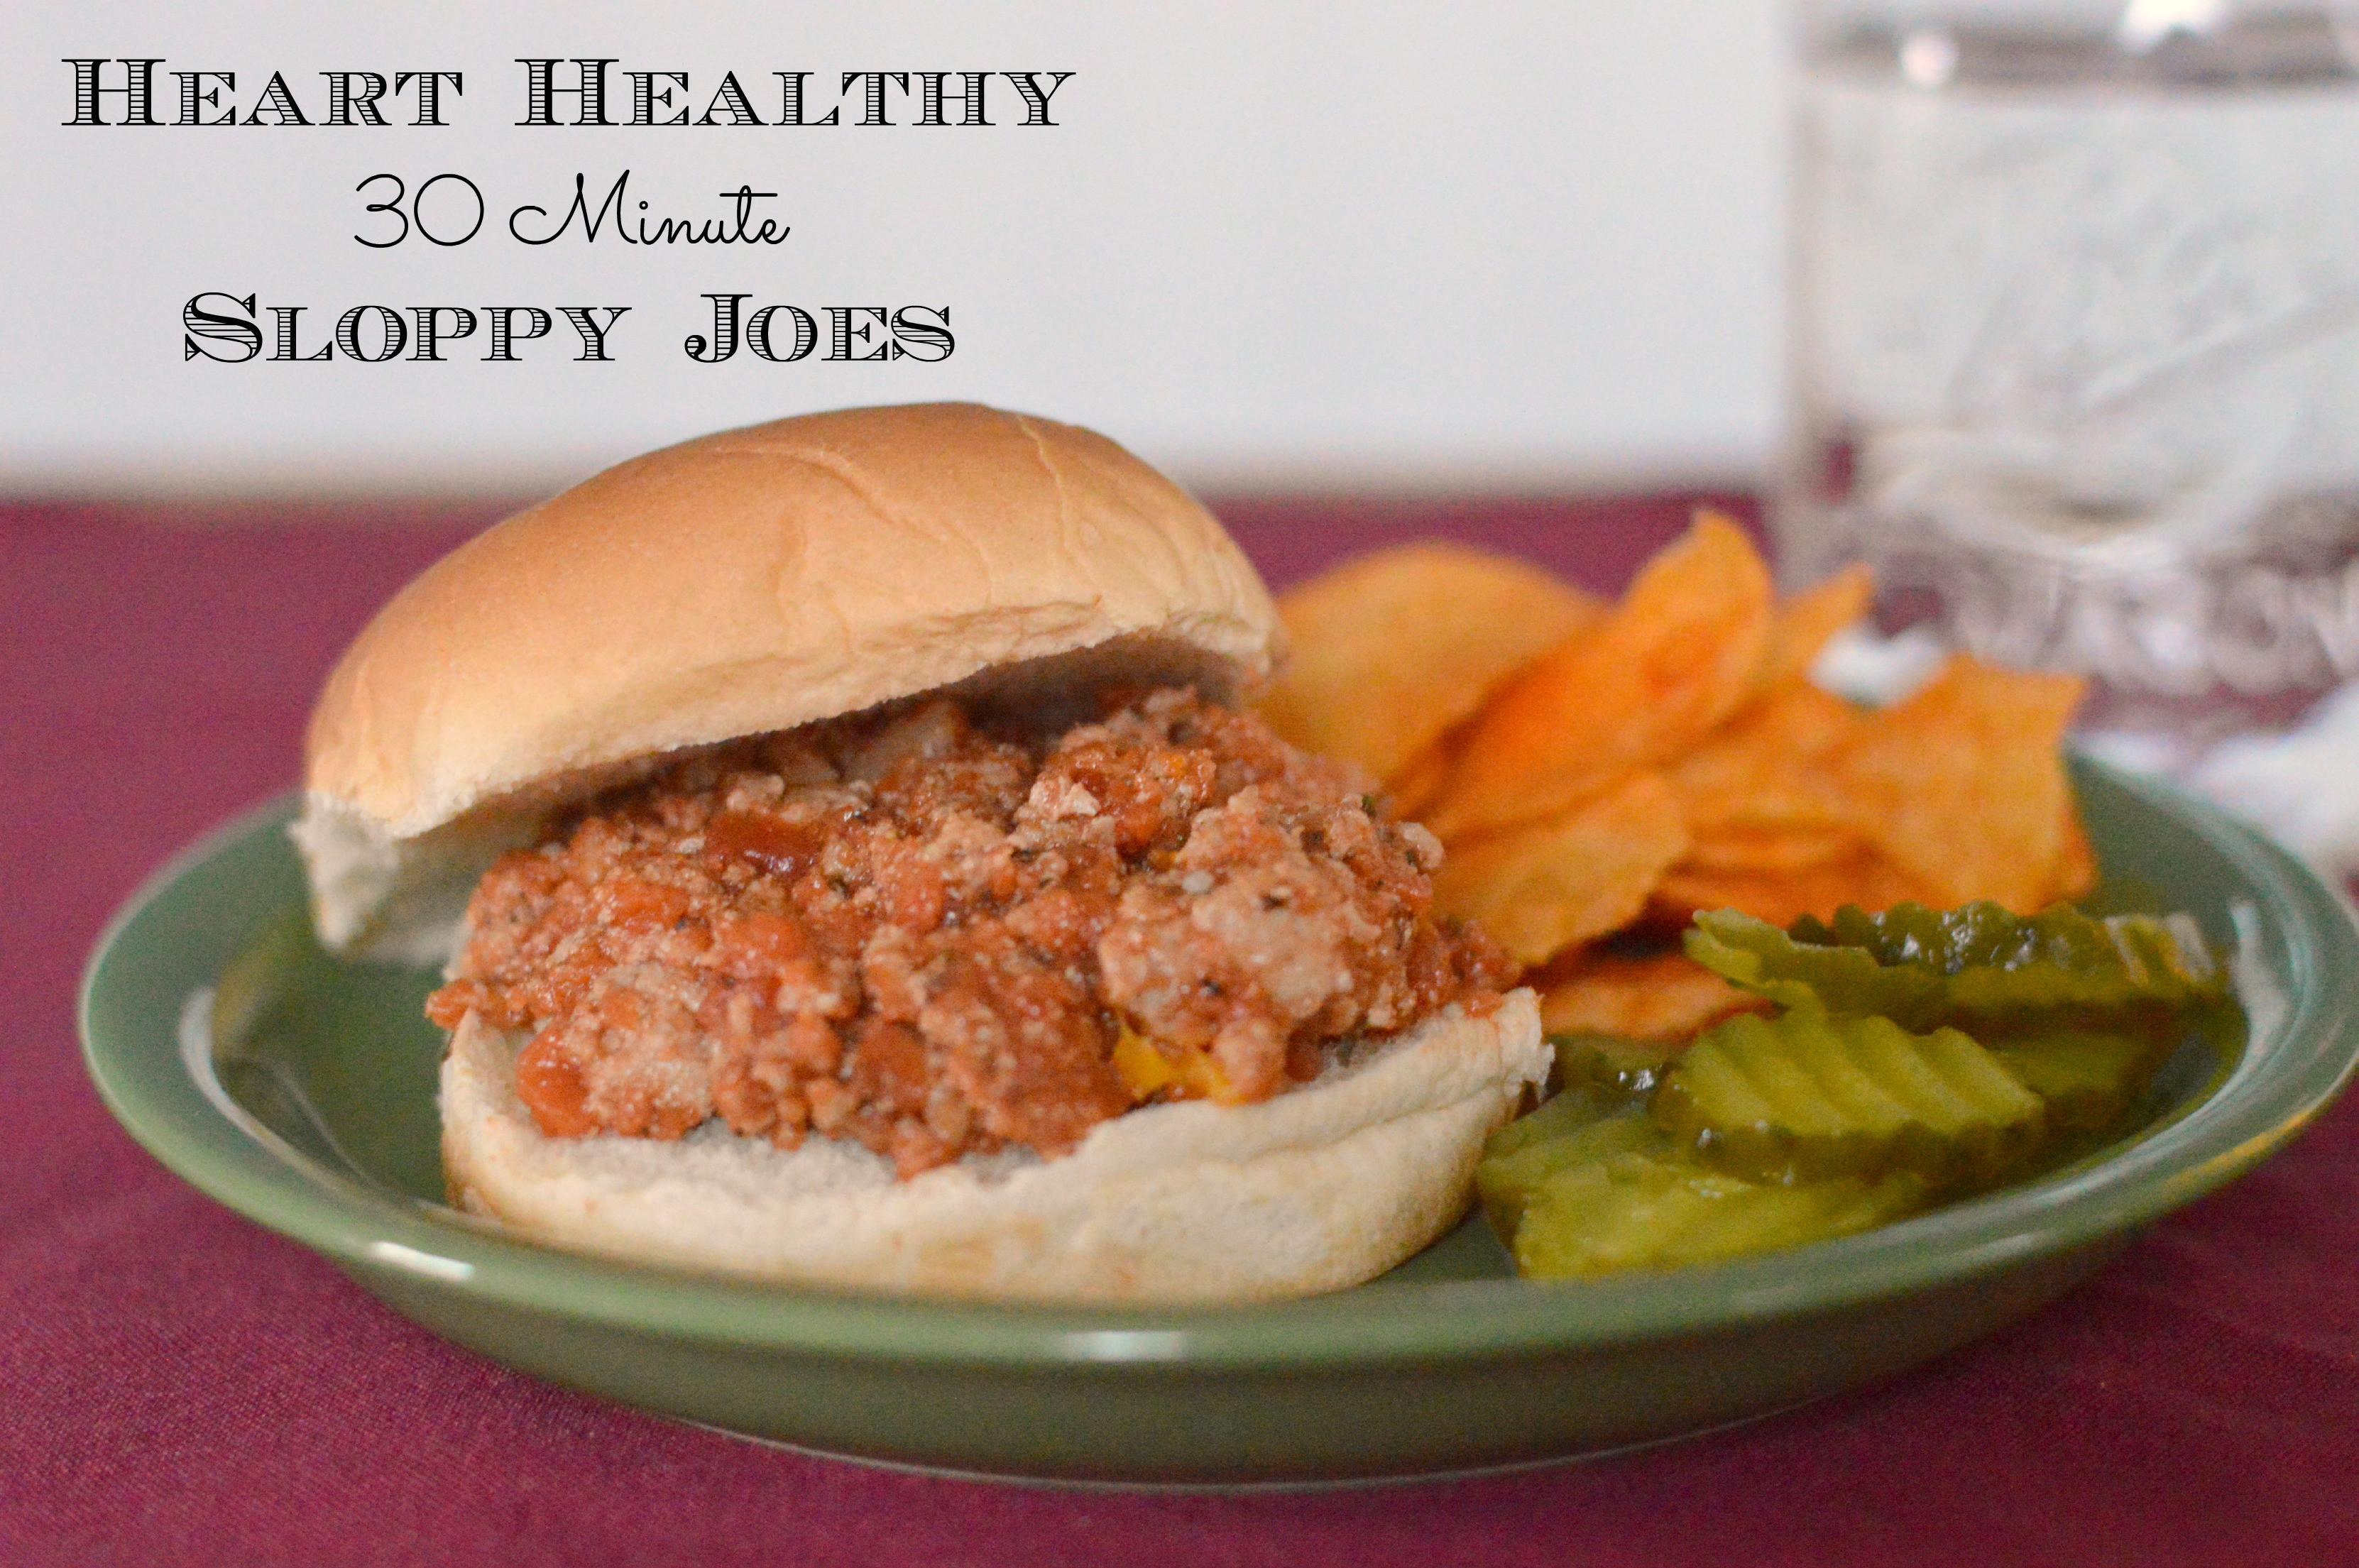 Sloppy Joes Healthy  5 Healthier for You Sloppy Joe Recipes SoFabFood